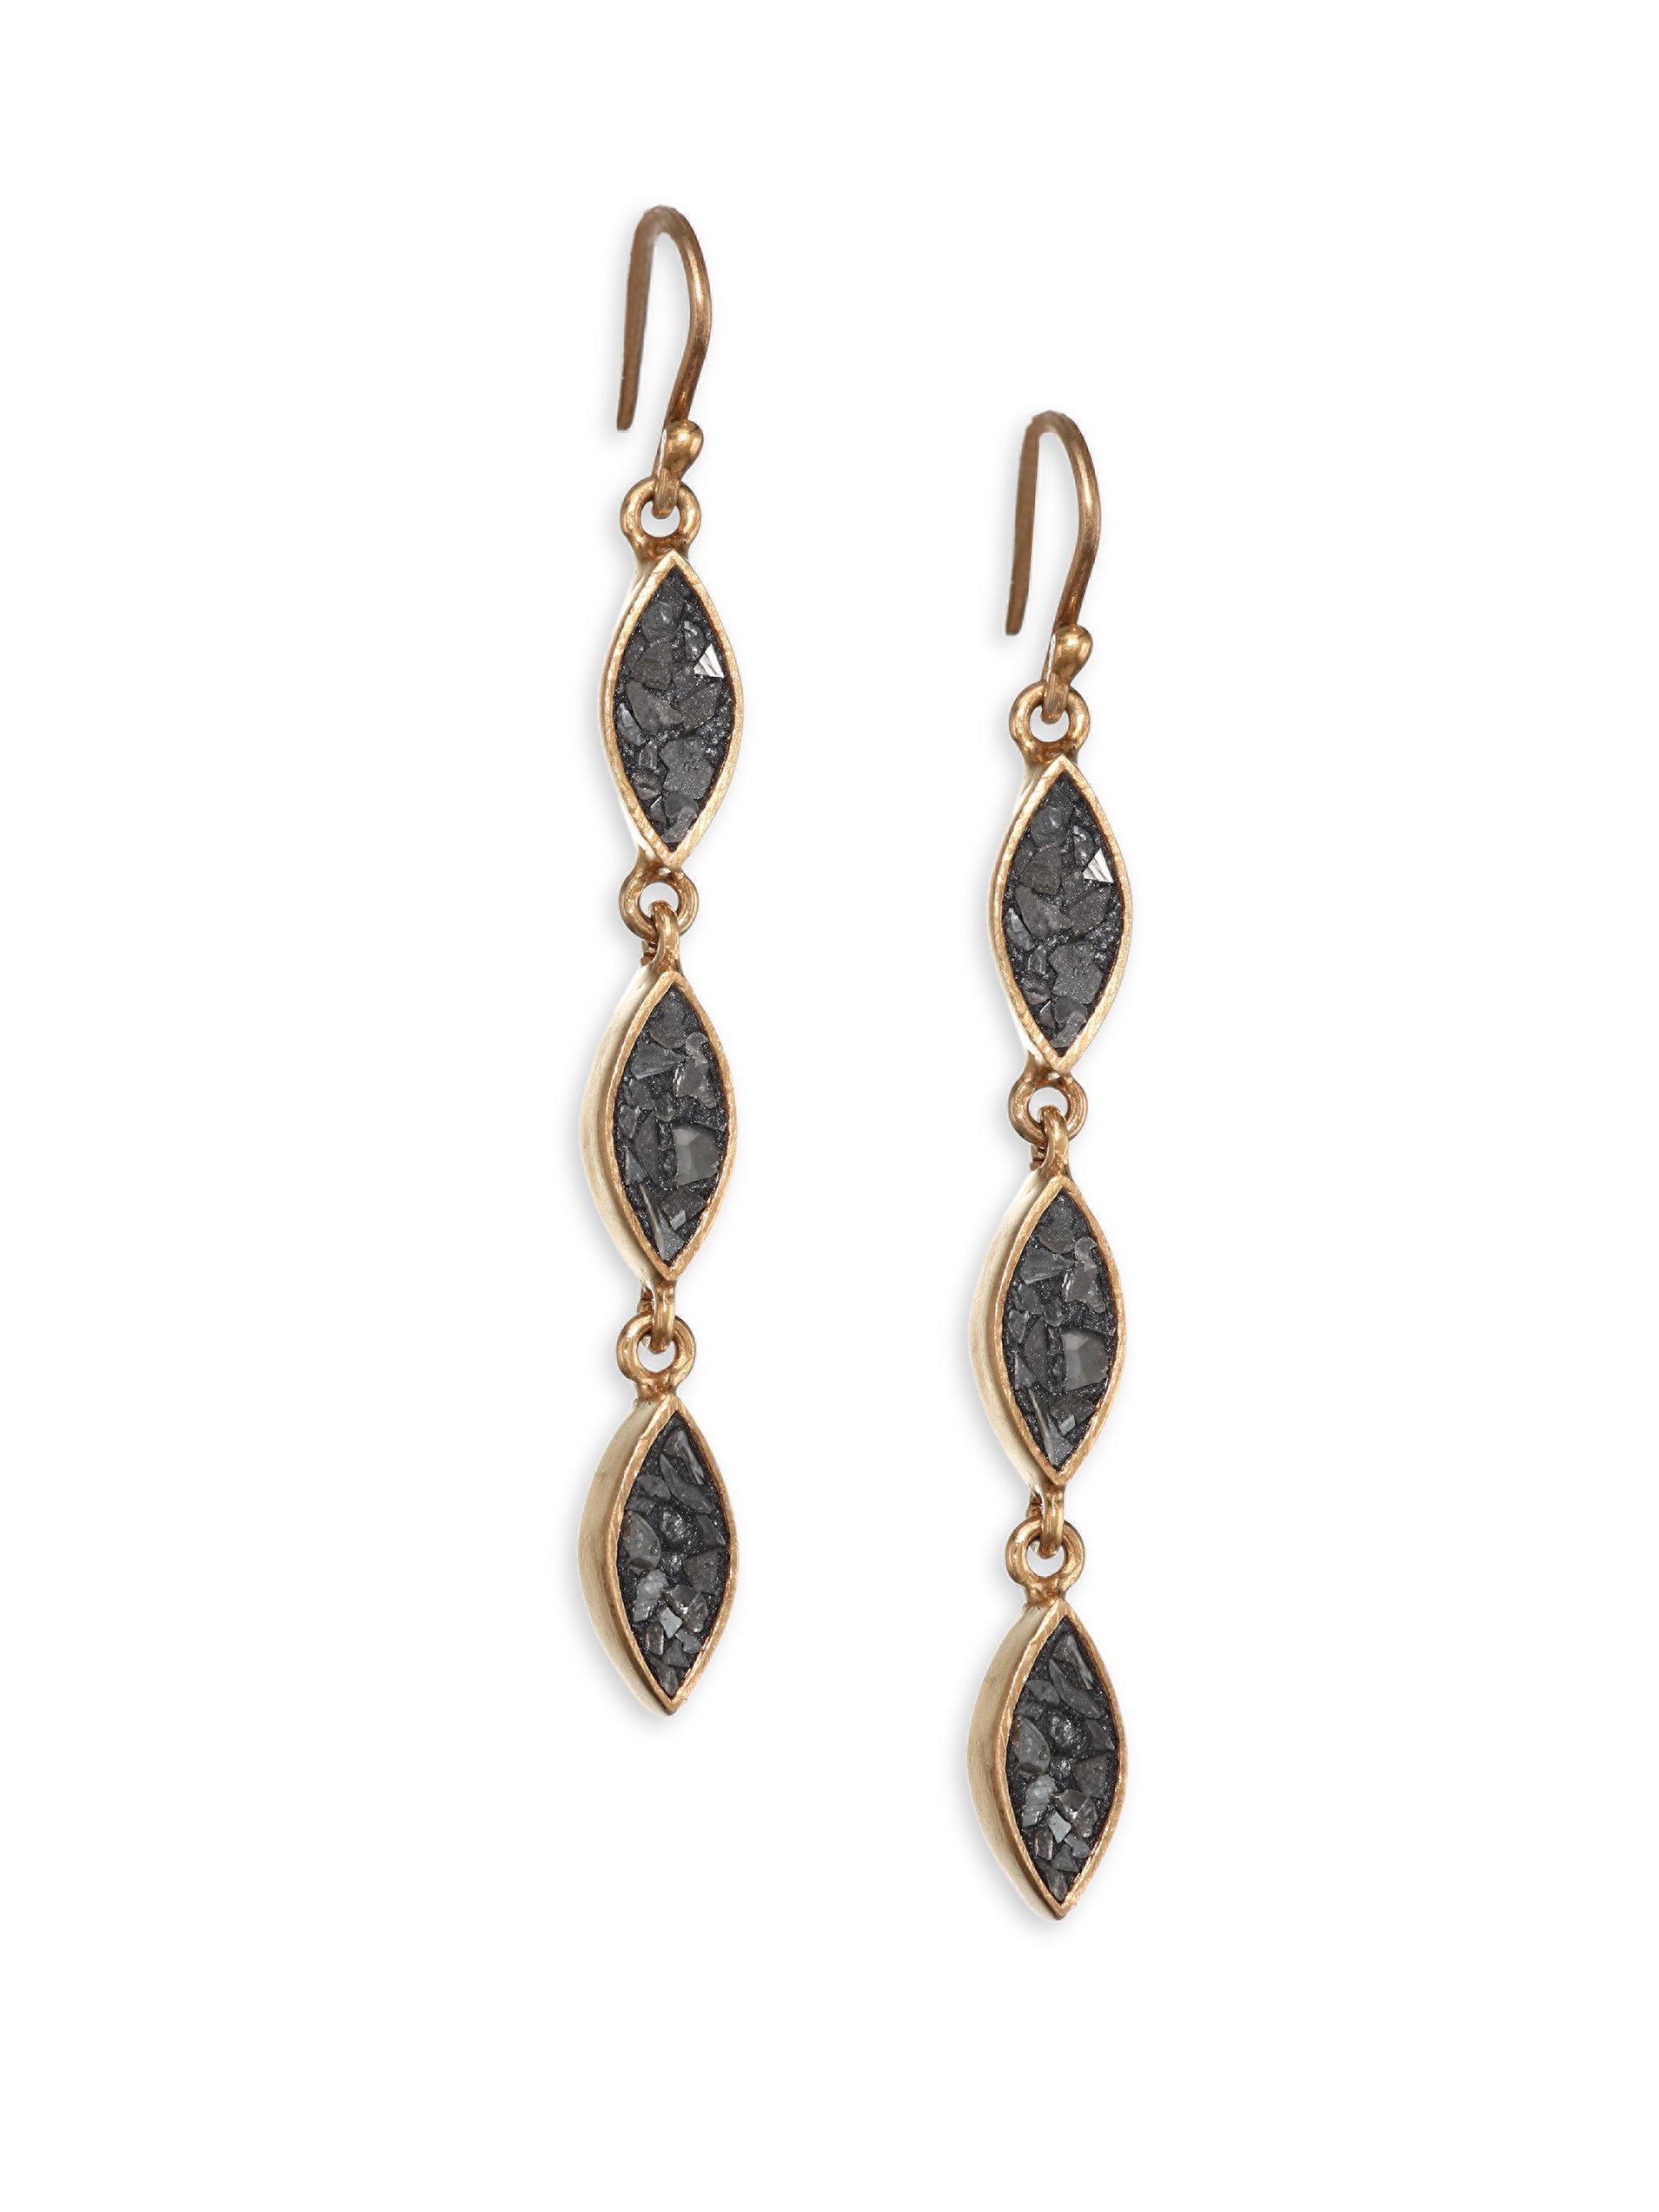 Lyst Shana Gulati Banjara Three Tier Linear Drop Earrings in Metallic